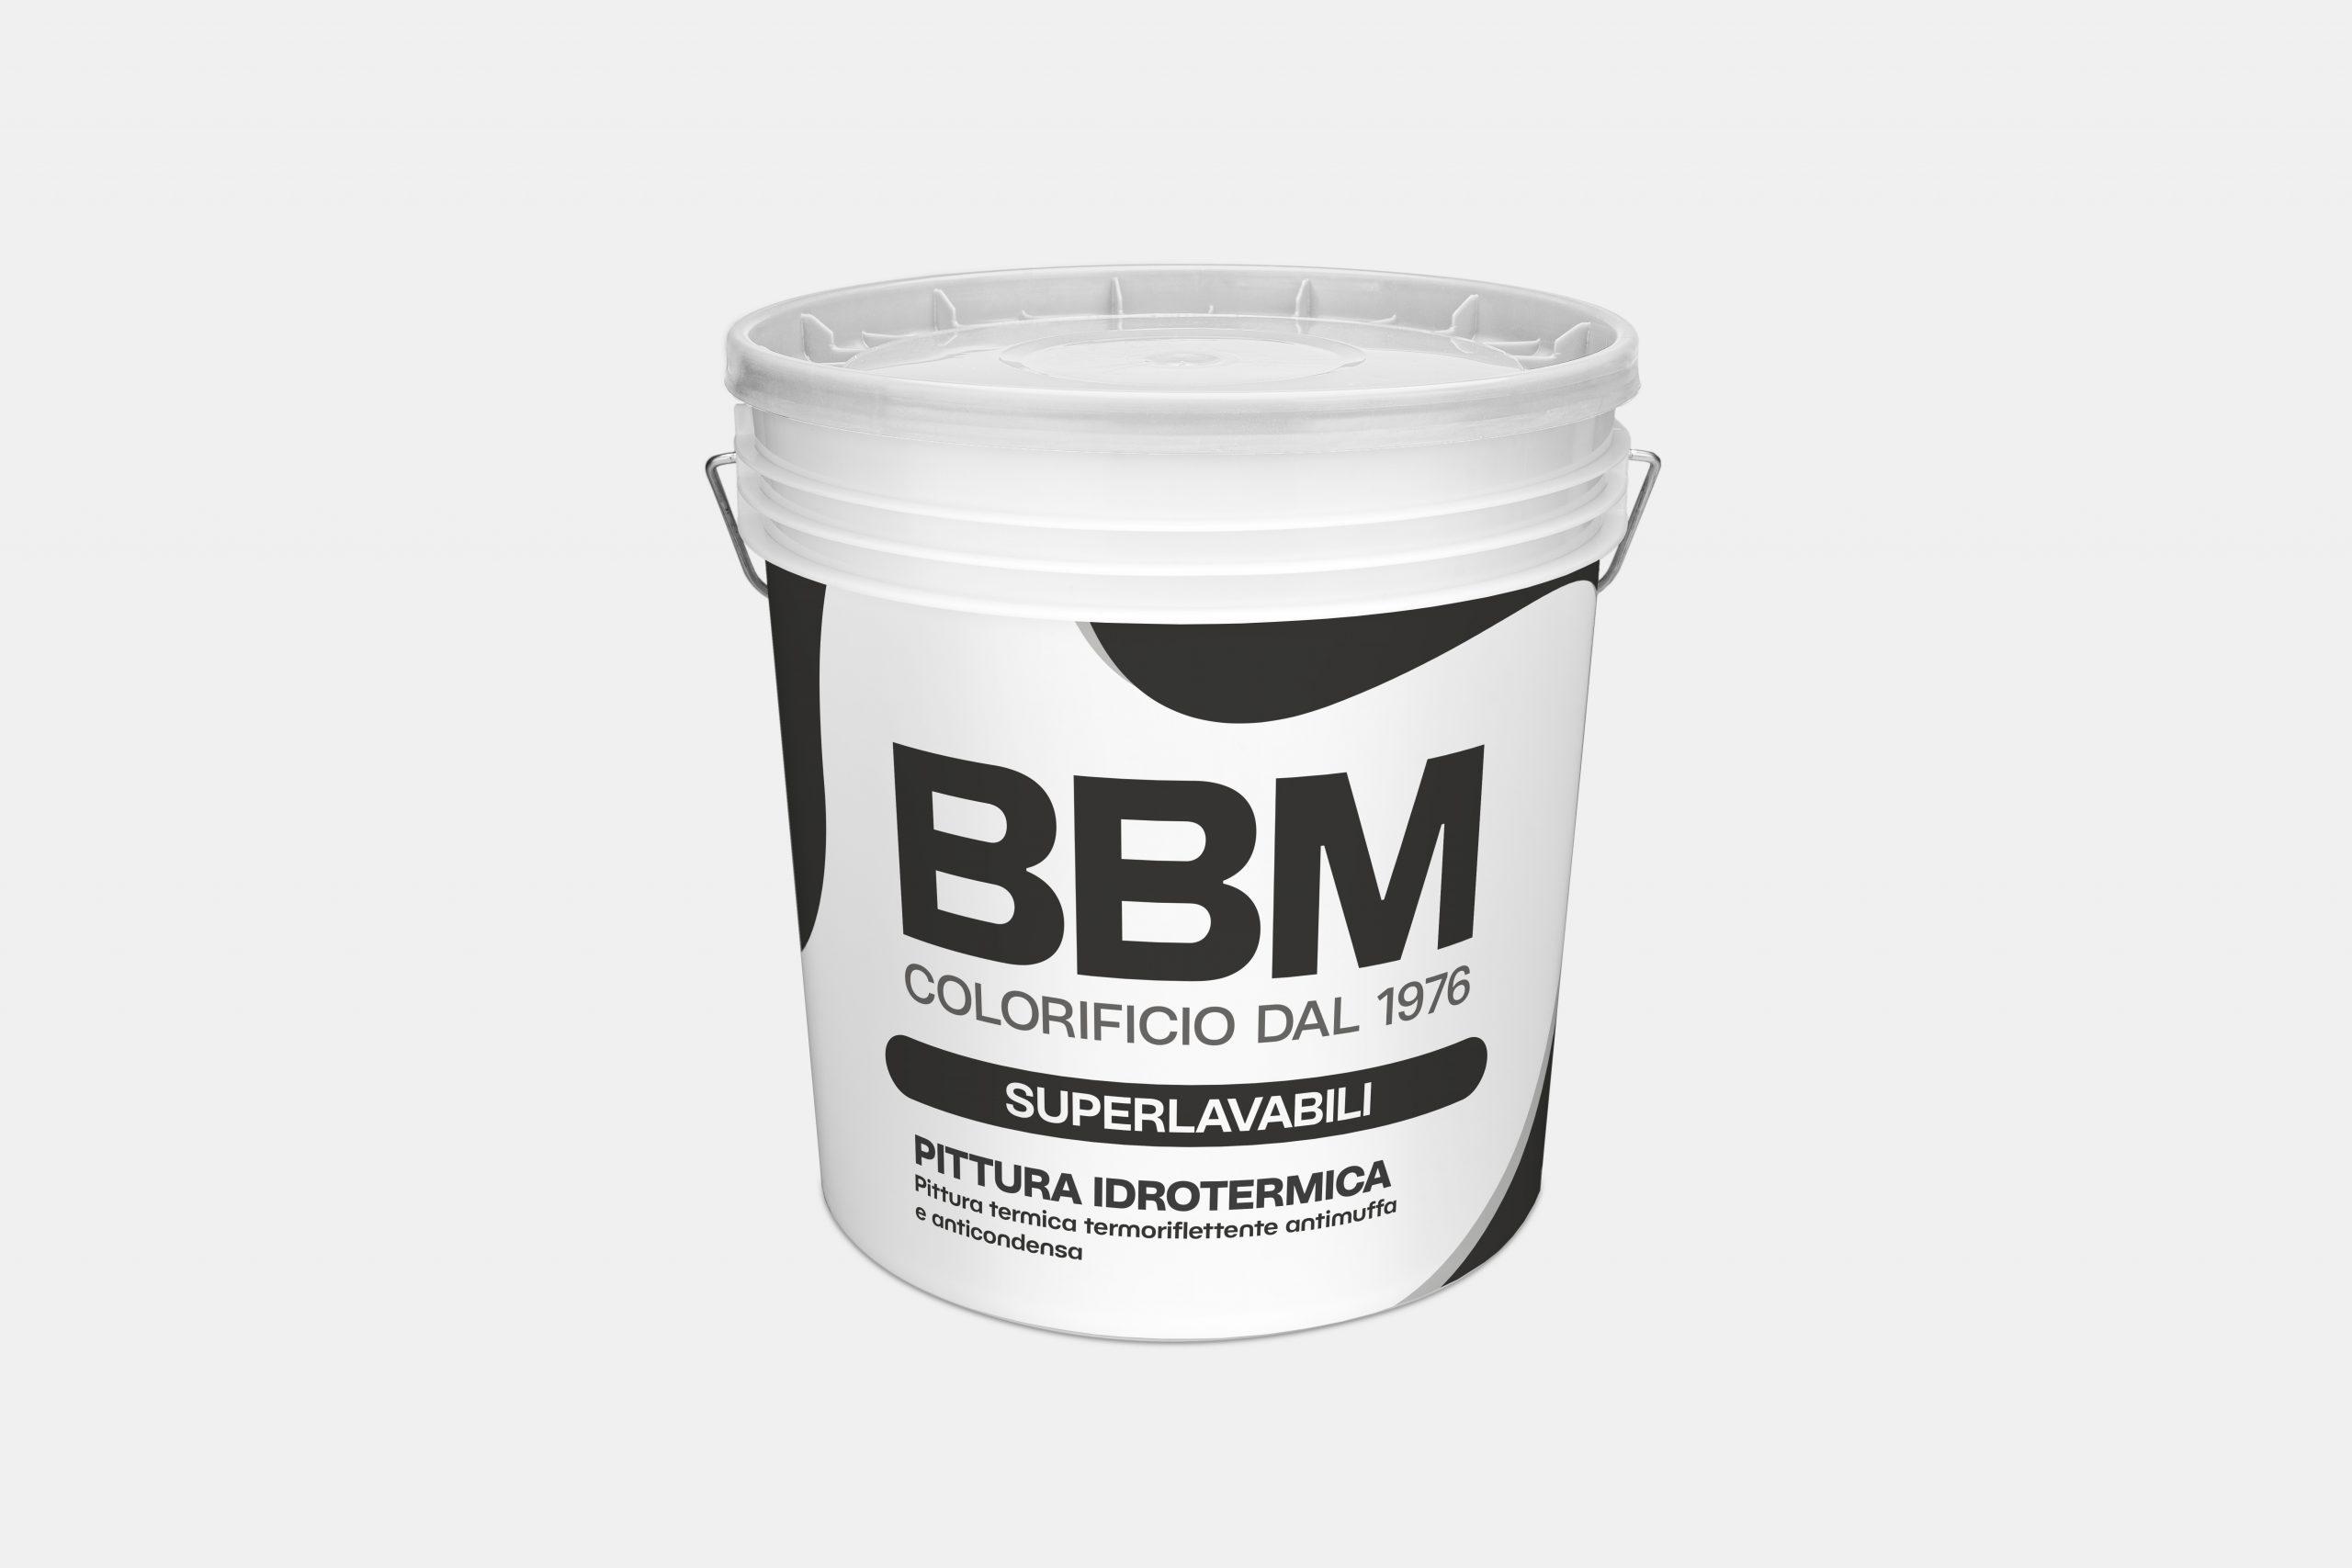 https://bbm-colorificio.it/wp-content/uploads/2021/07/Pittura-idrotermica-scaled.jpg